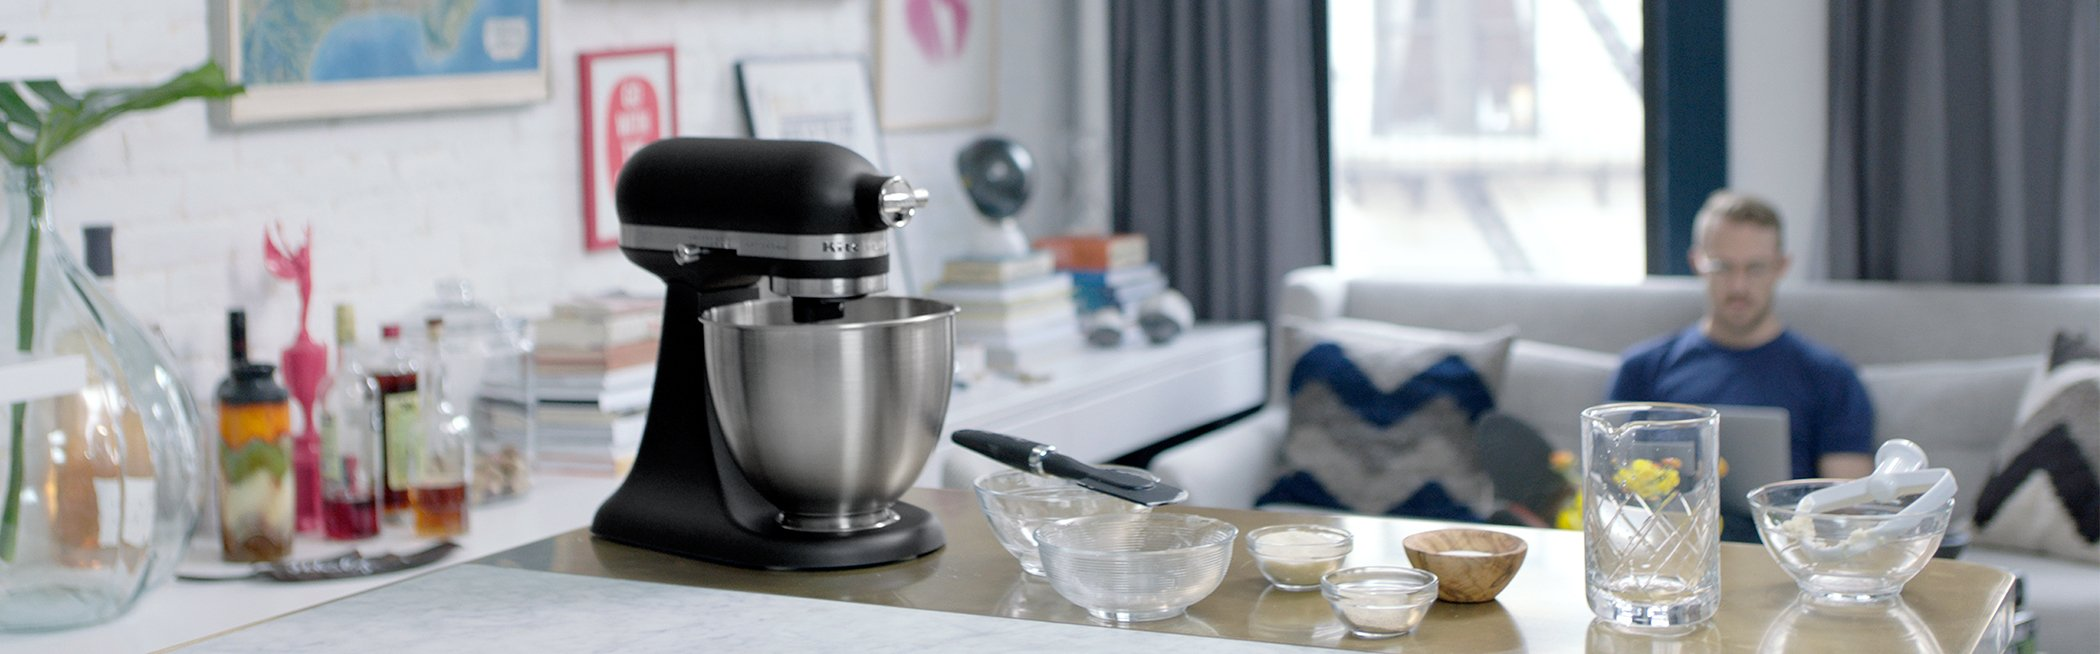 KitchenAid KSM3311XBM Artisan Mini Series Tilt-Head Stand Mixer, 3.5 quart, Matte Black by KitchenAid (Image #2)